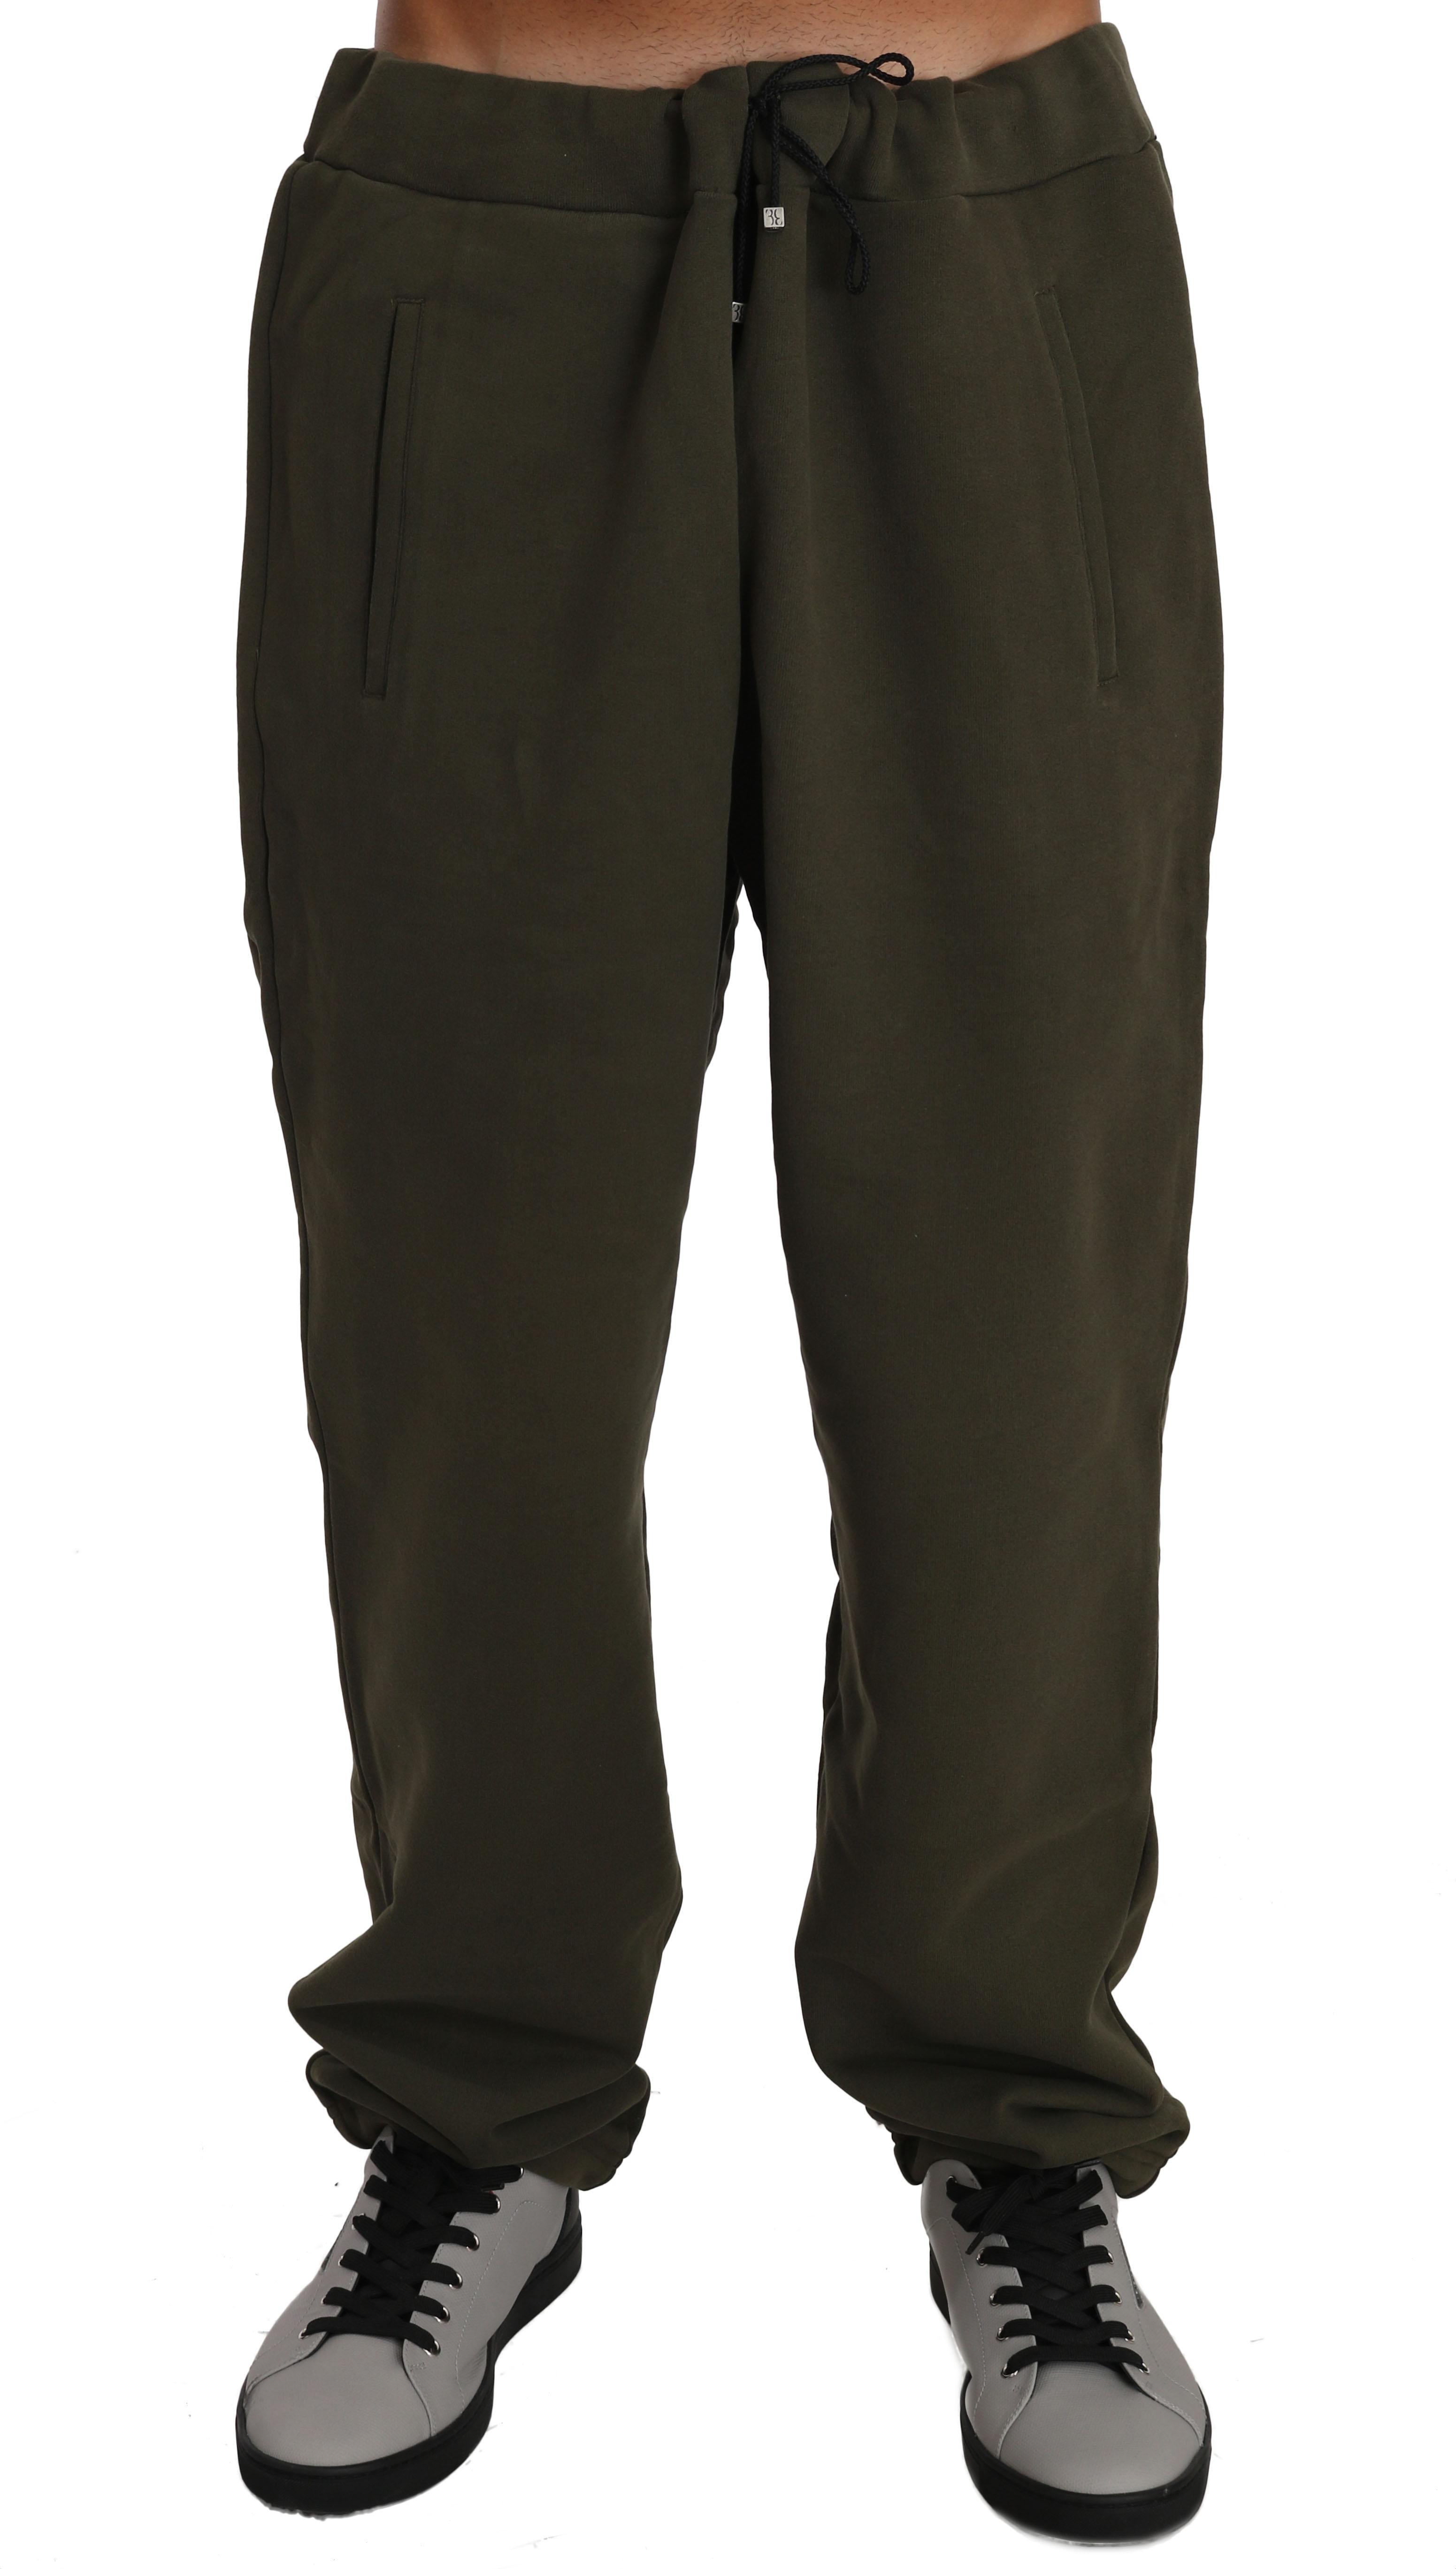 Green Fleece Mens Gym Trouser